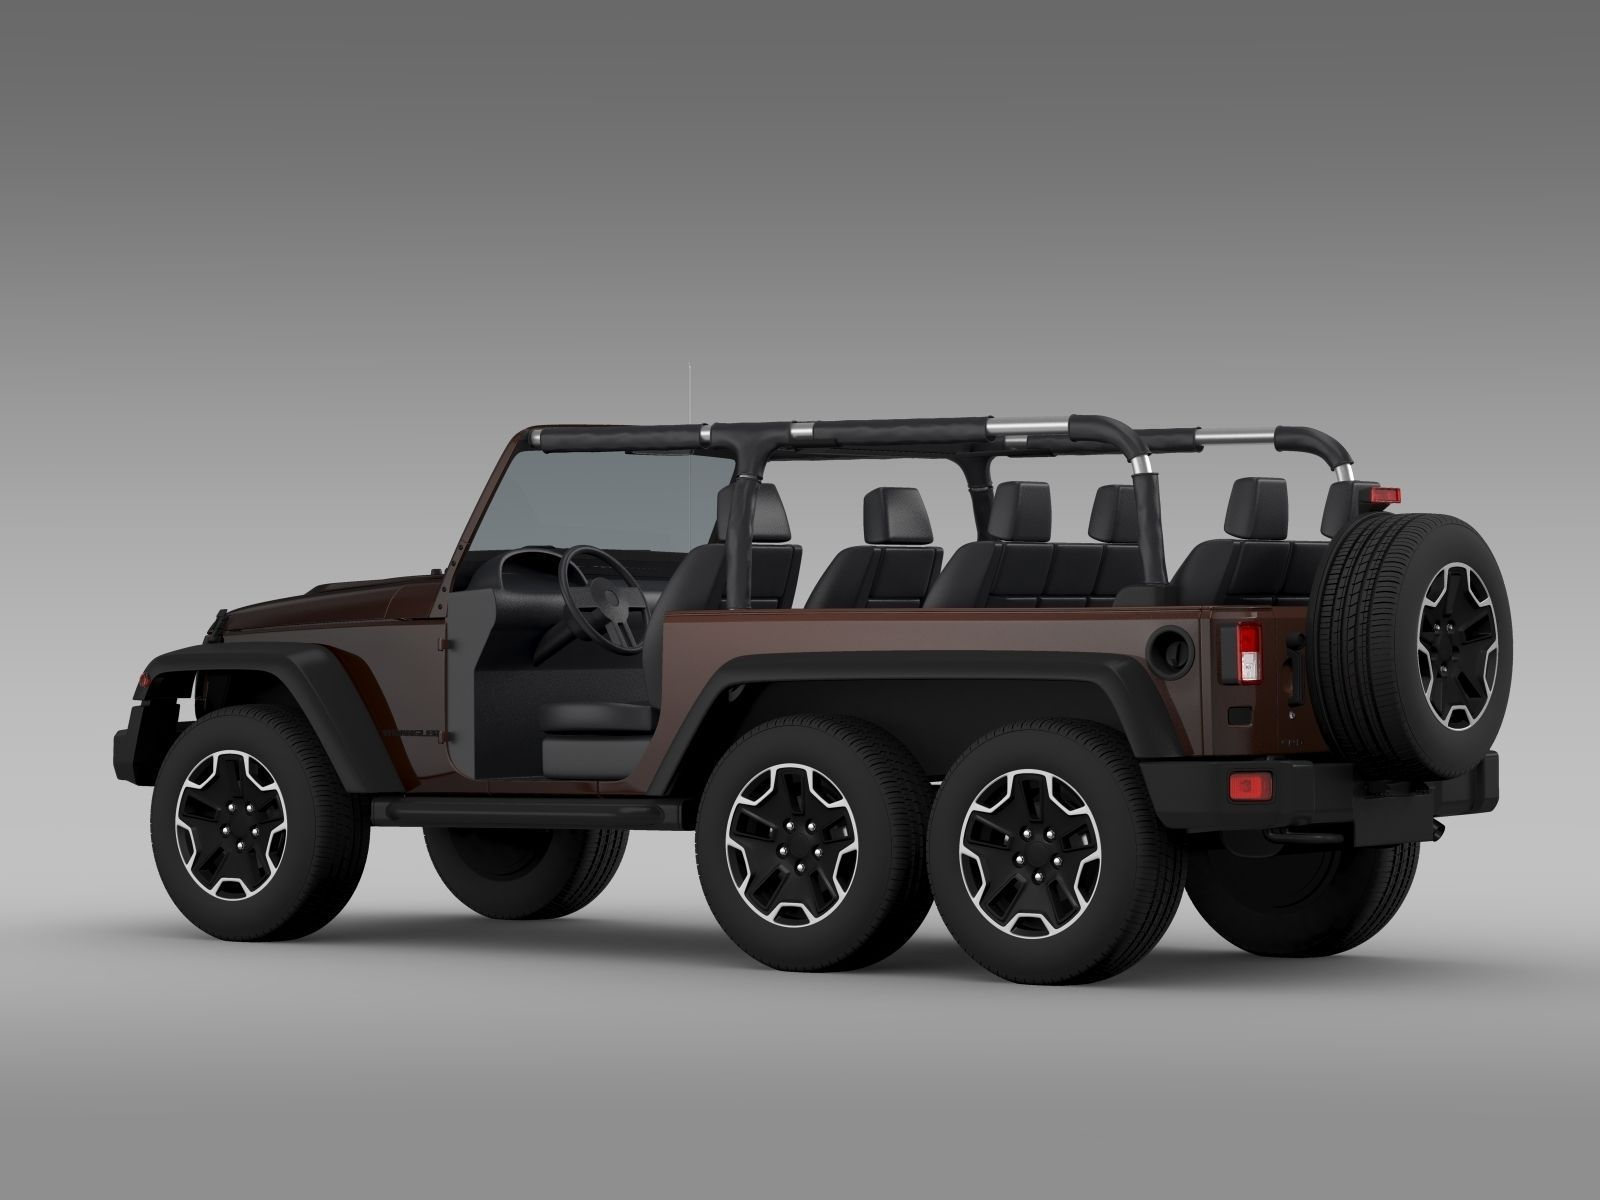 jeep wrangler rubicon 6x6 2016 3d model max obj 3ds fbx c4d lwo lw lws. Black Bedroom Furniture Sets. Home Design Ideas